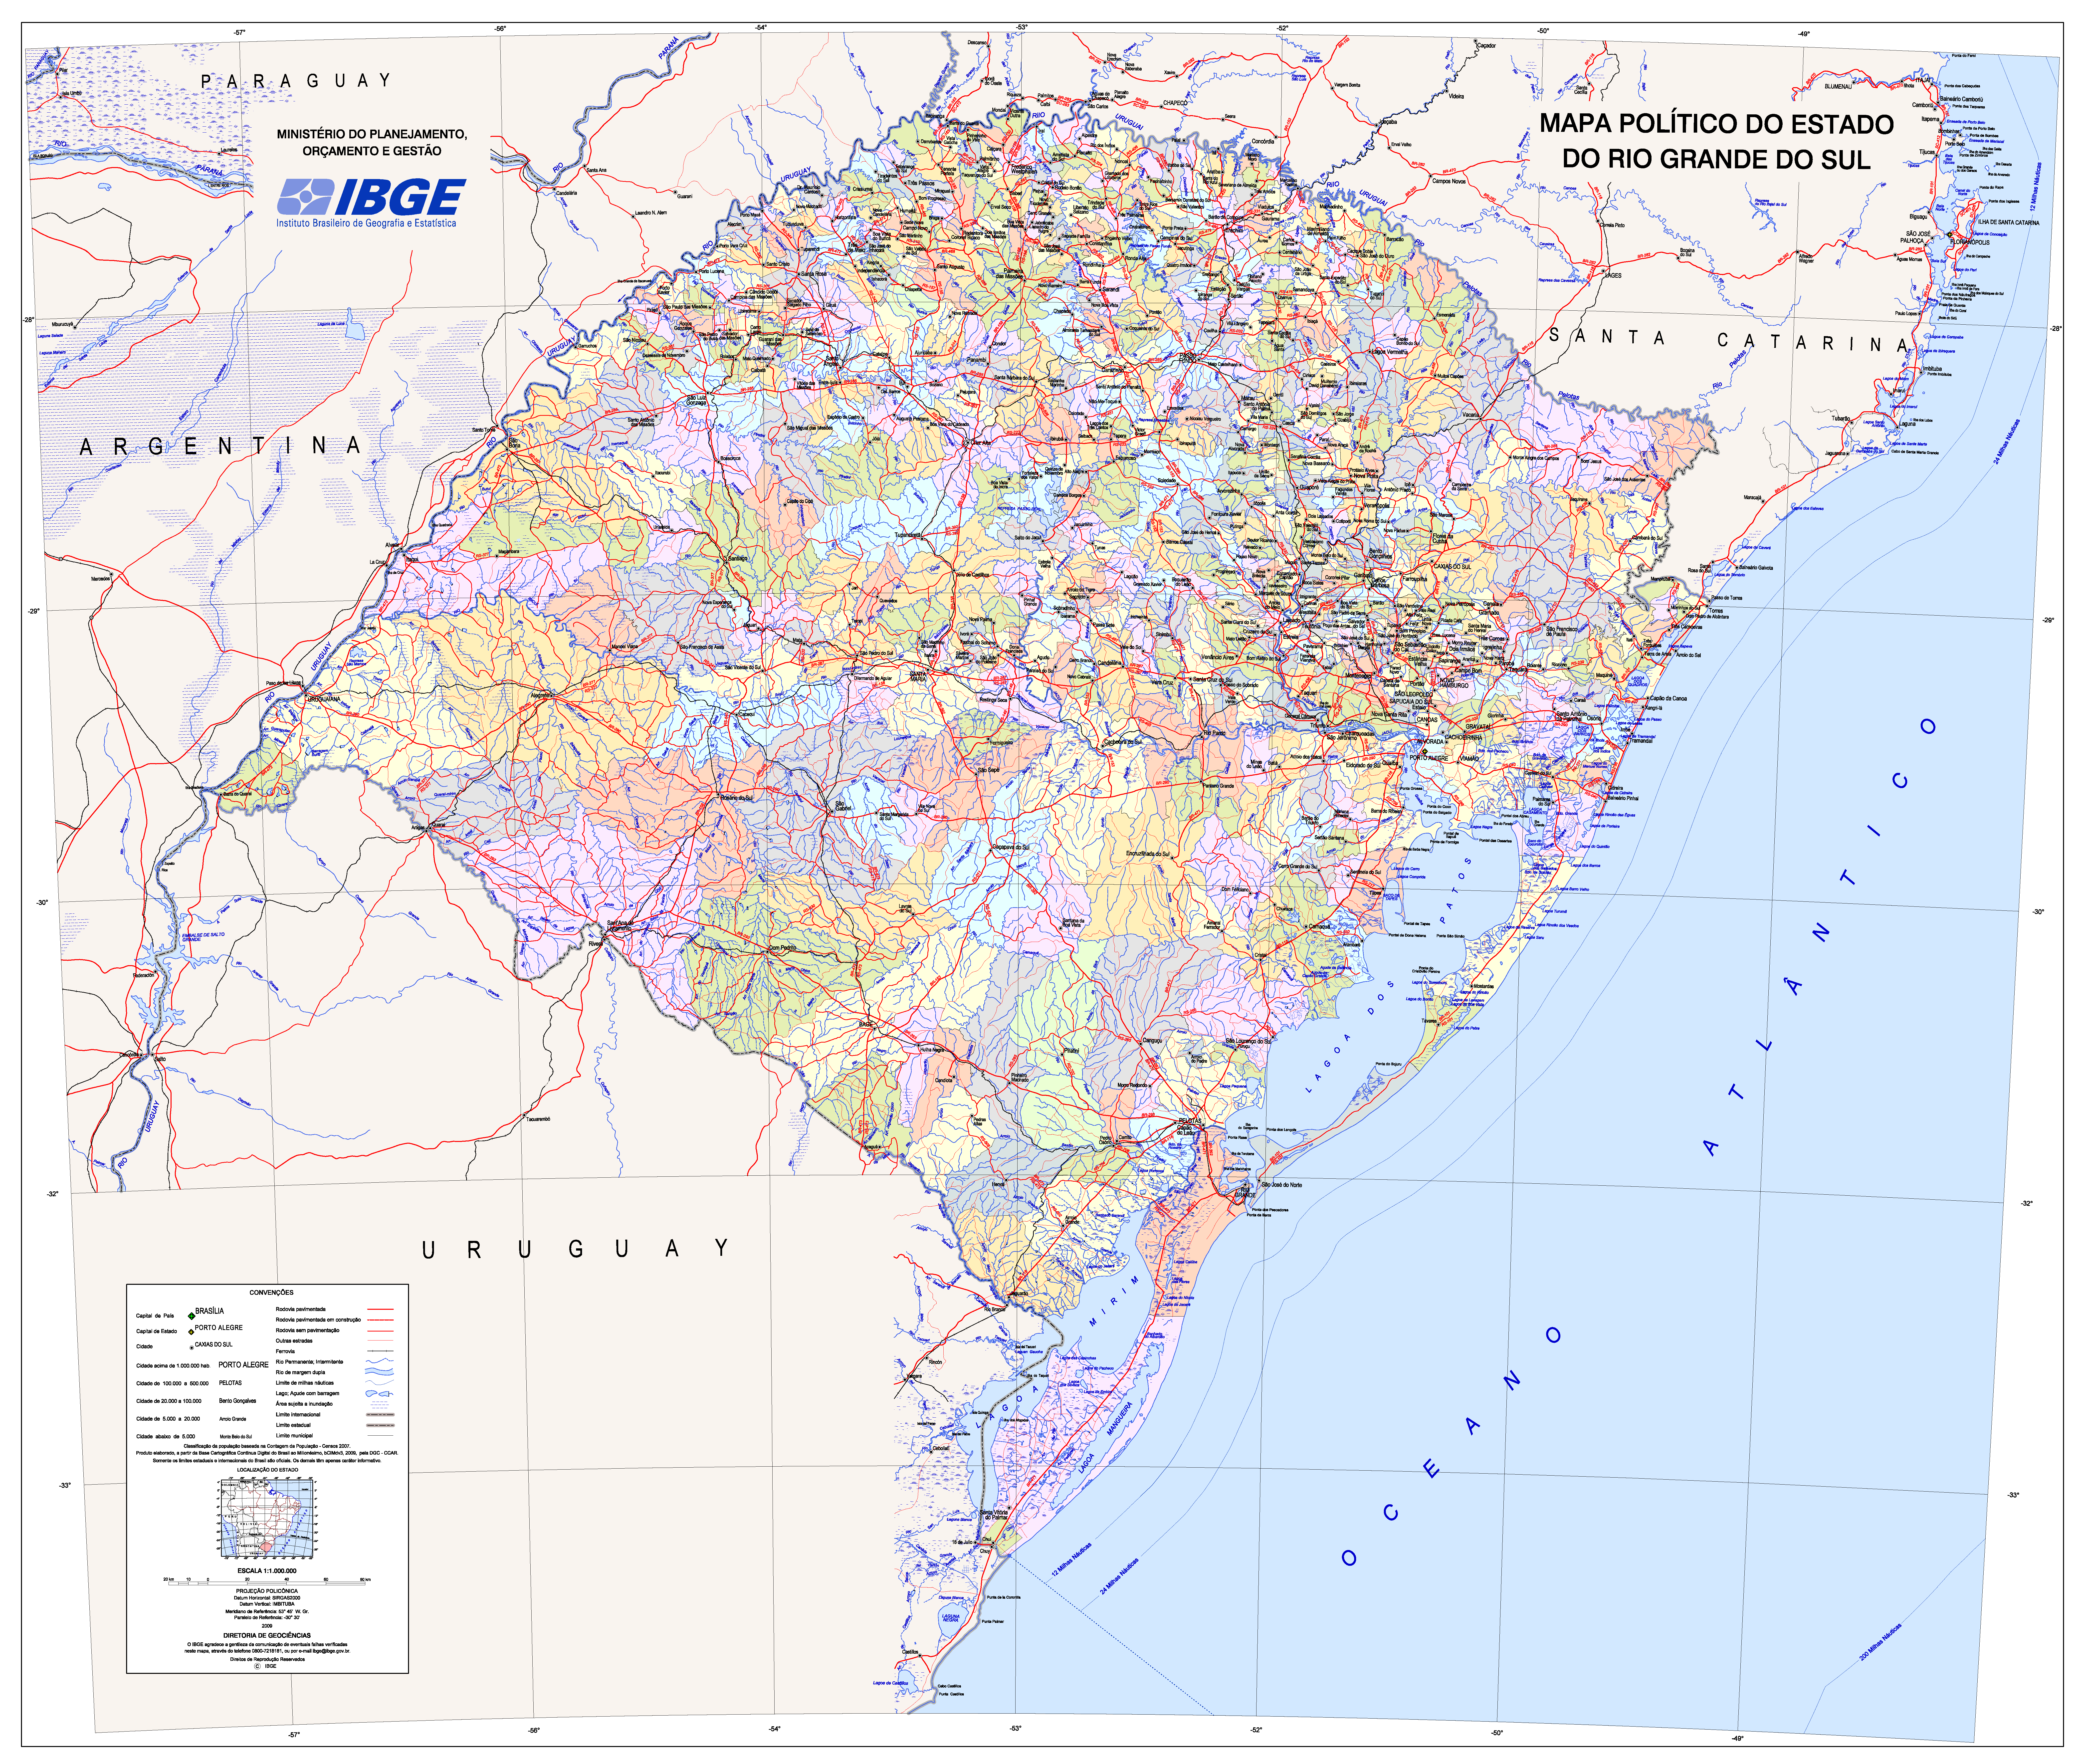 Rio Grande Mapa Fisico.Mapas E Cartografia Mapa Politico Do Estado Do Rio Grande